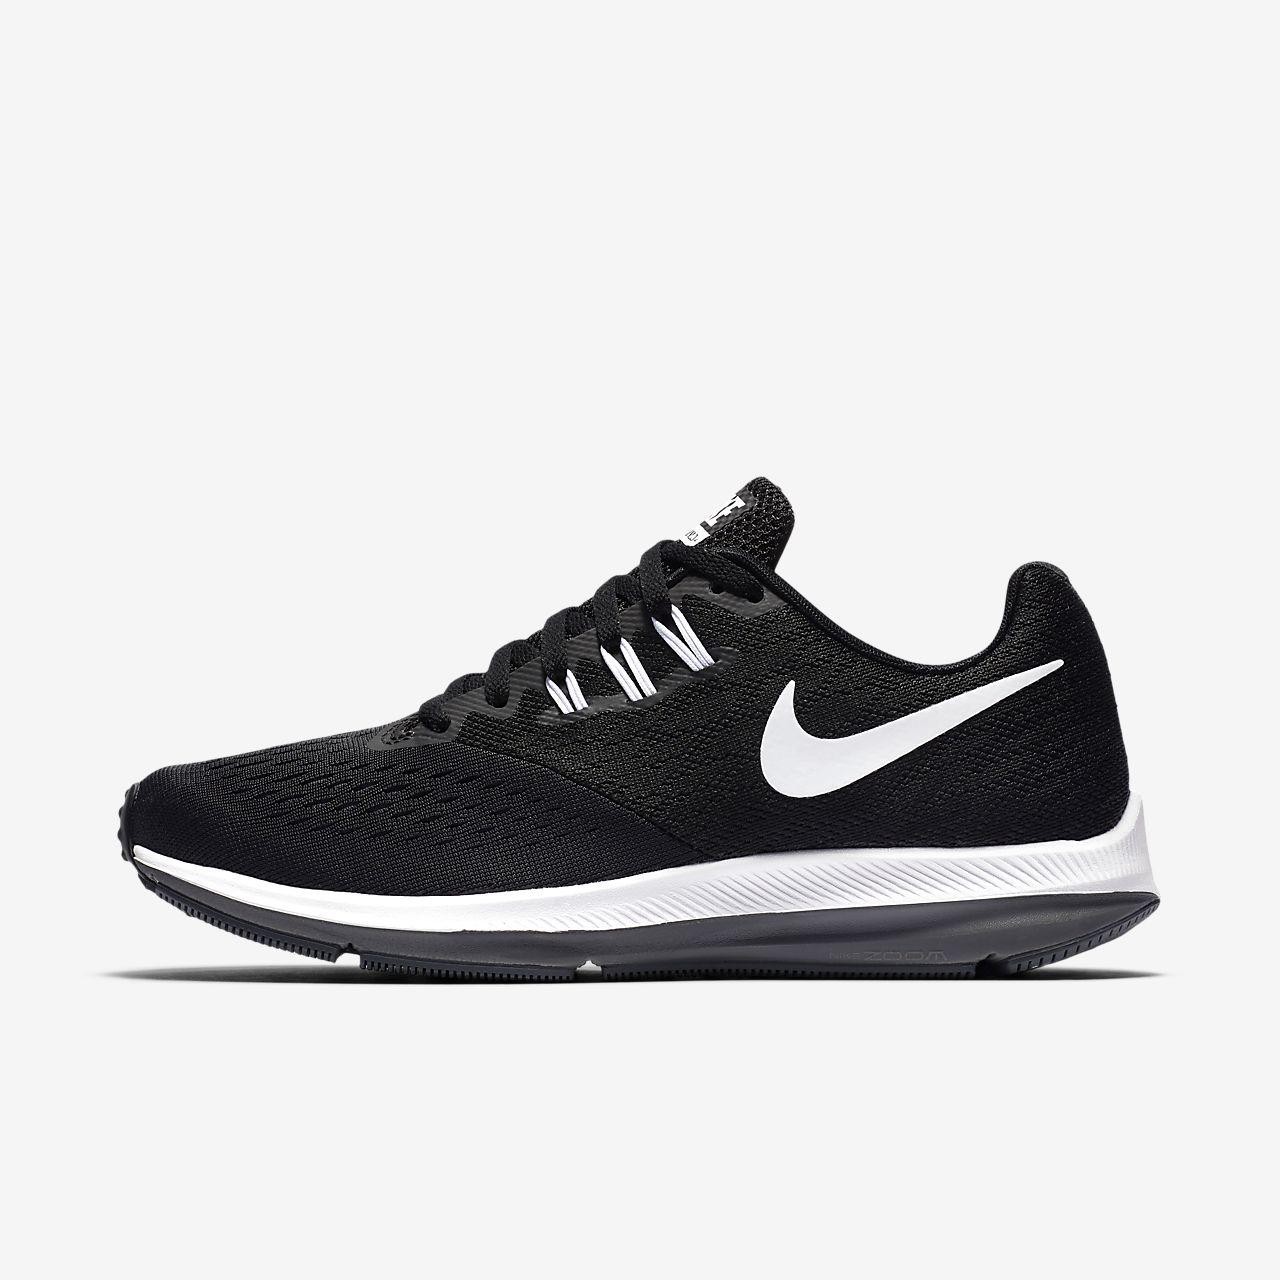 buy popular 2a802 807ac Chaussure de running Nike Zoom Winflo 4 pour Femme